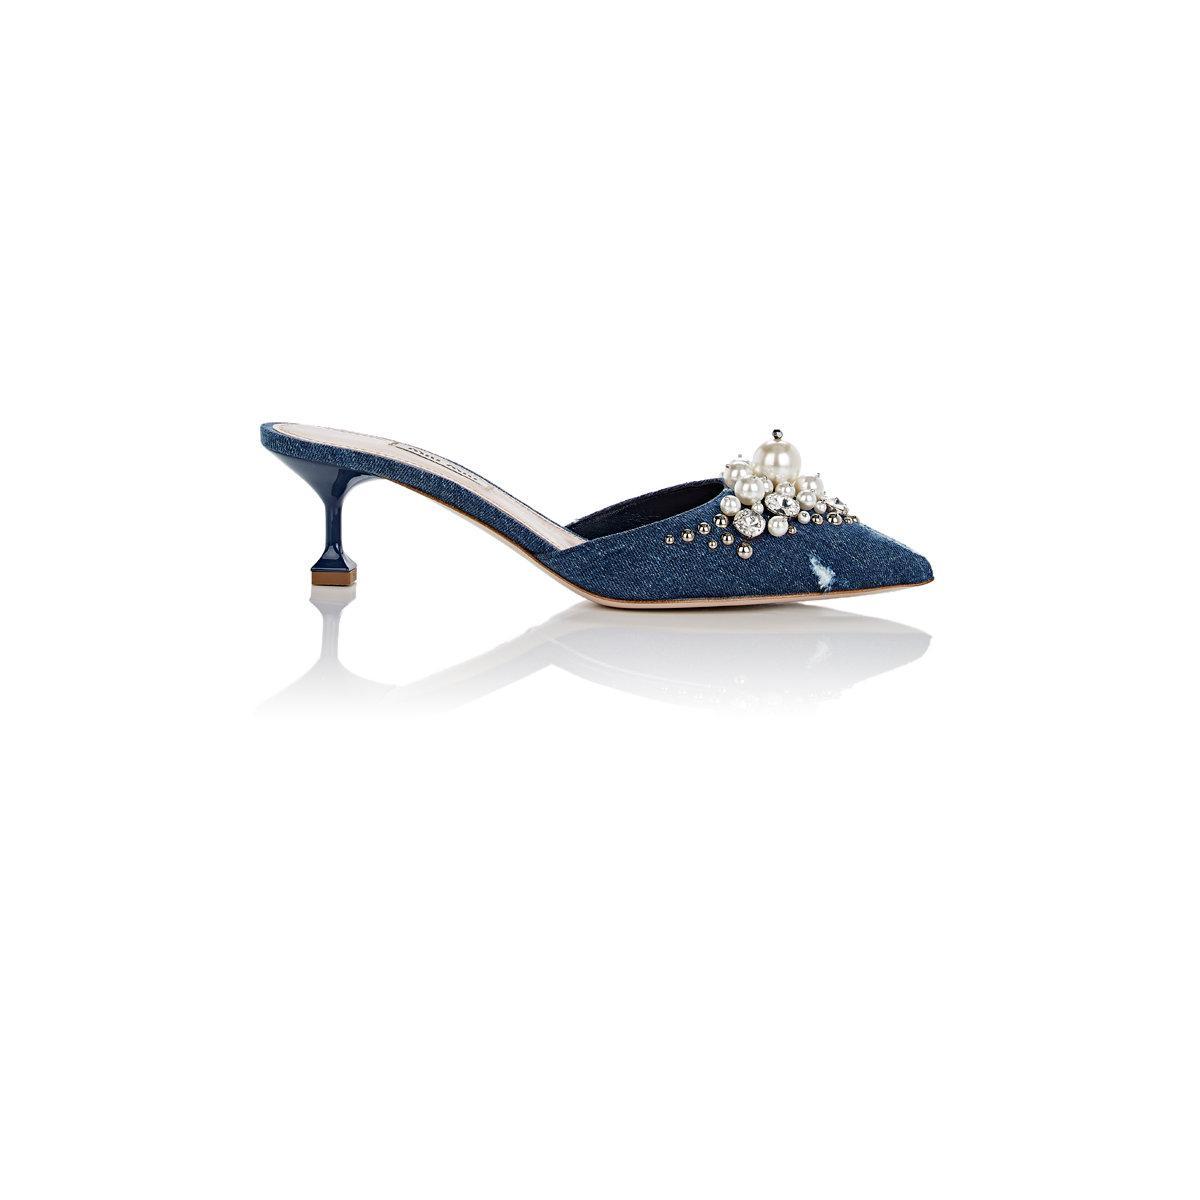 Miu Miu Perles Mules Denim Bleu Embelli - dzNk3